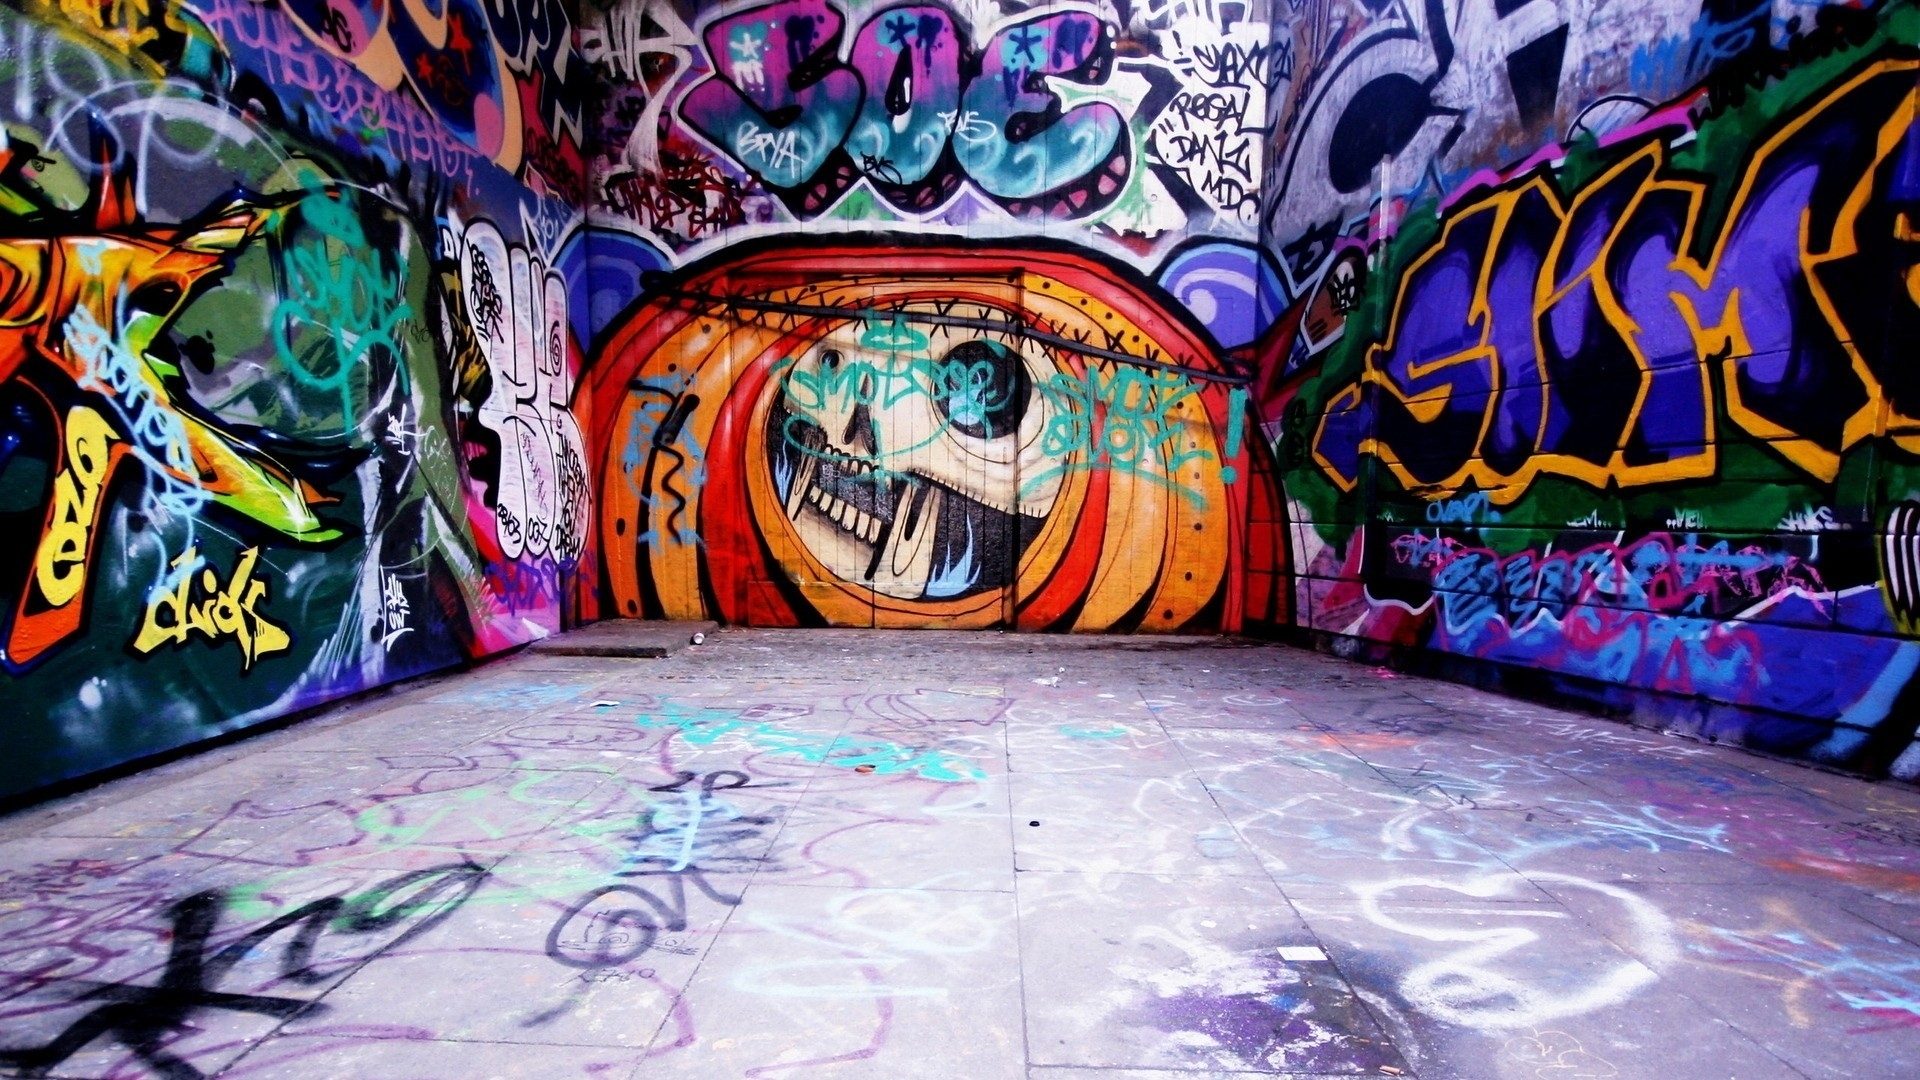 Graffiti Wall Art Wallpaper | Allwallpaper (View 12 of 20)